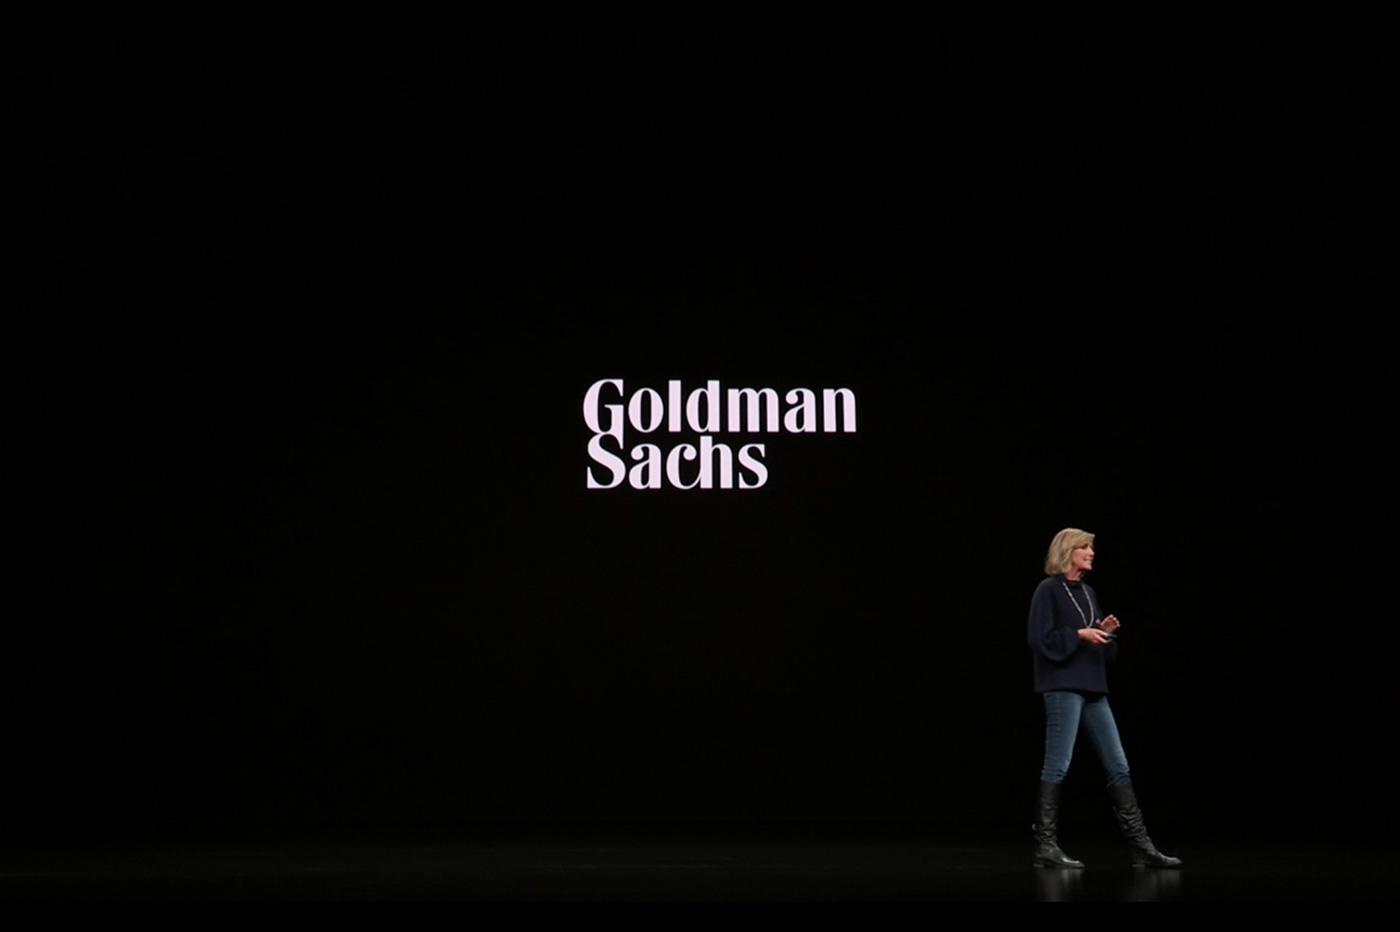 Apple card Goldman Sachs